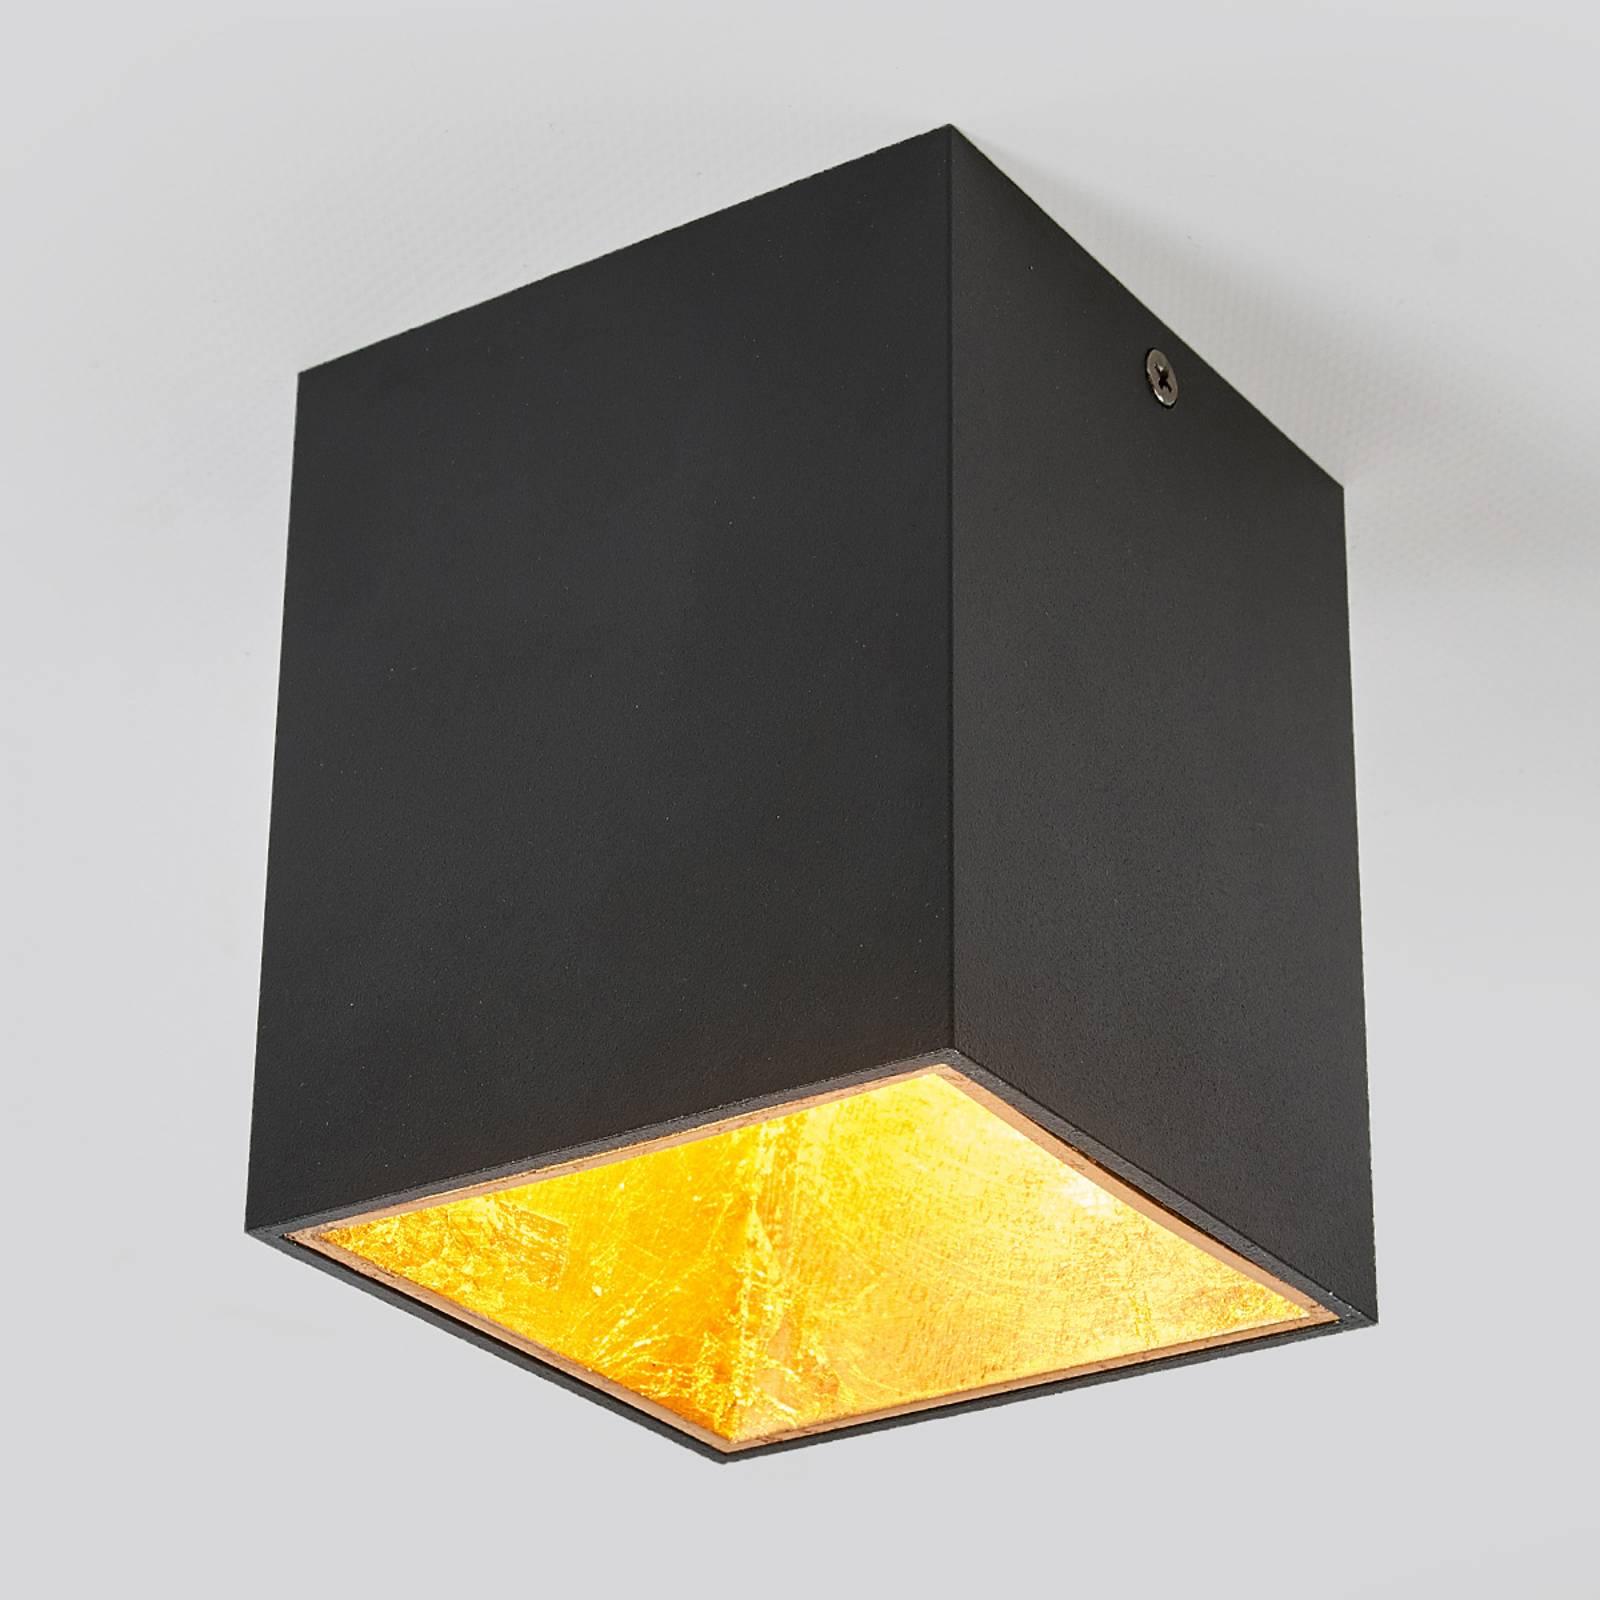 Kubusvormig LED plafondlamp Juma, zwart-goud